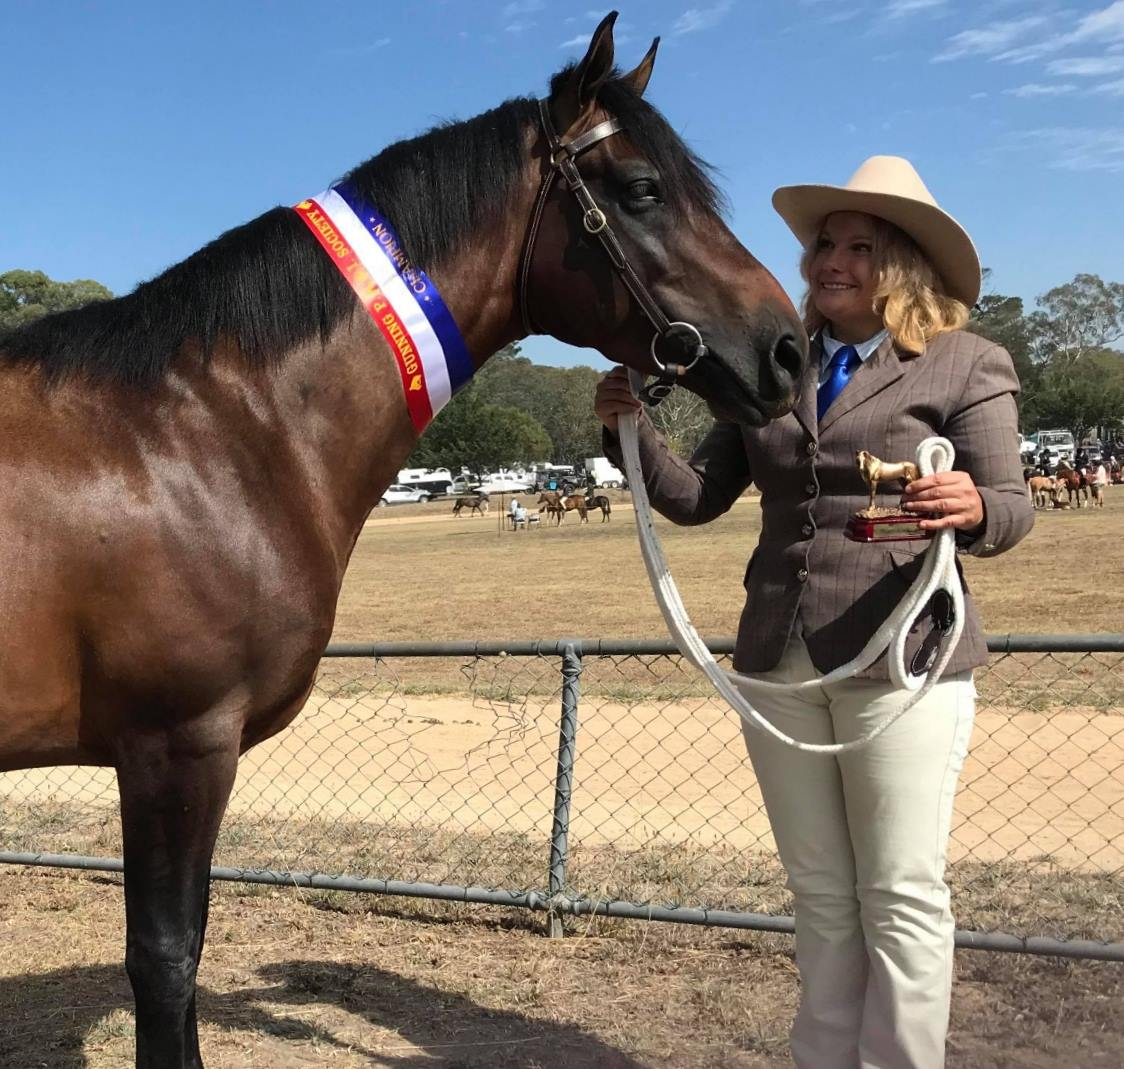 Trublu Trail Blazer, Waler colt at Gunning Show 2018